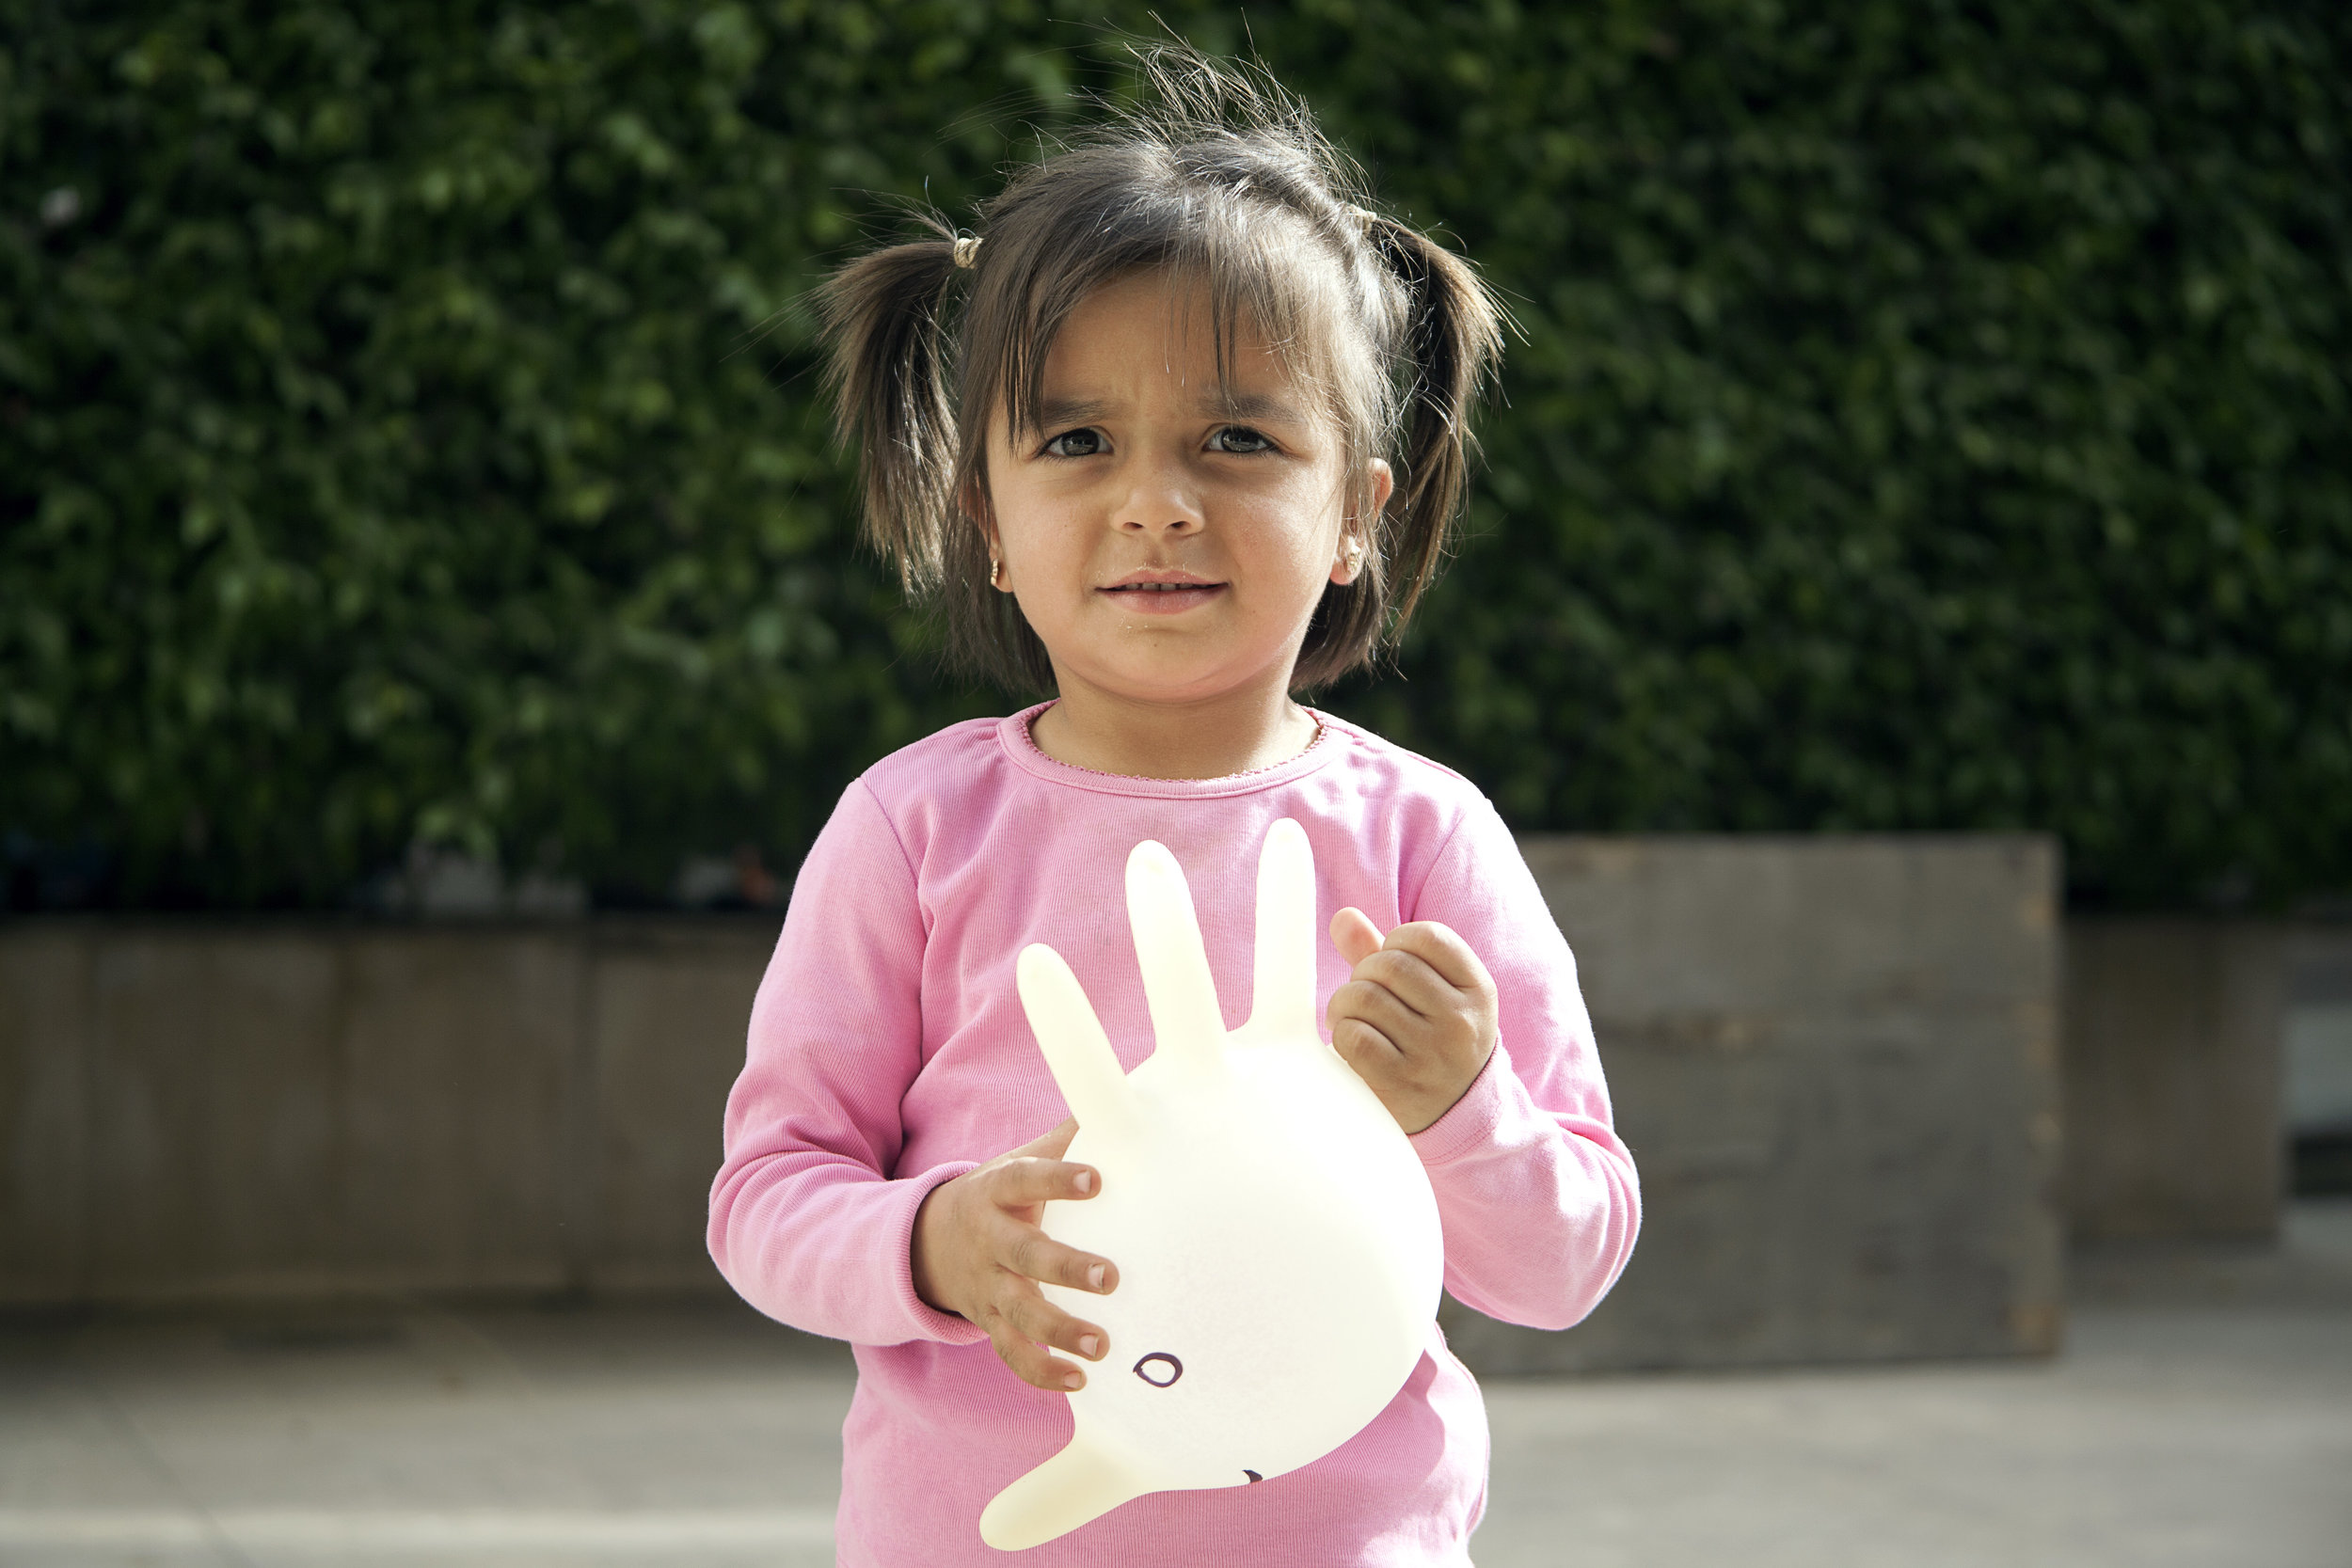 INARA Syria Arwa Damon refugees Mosul Lebanon